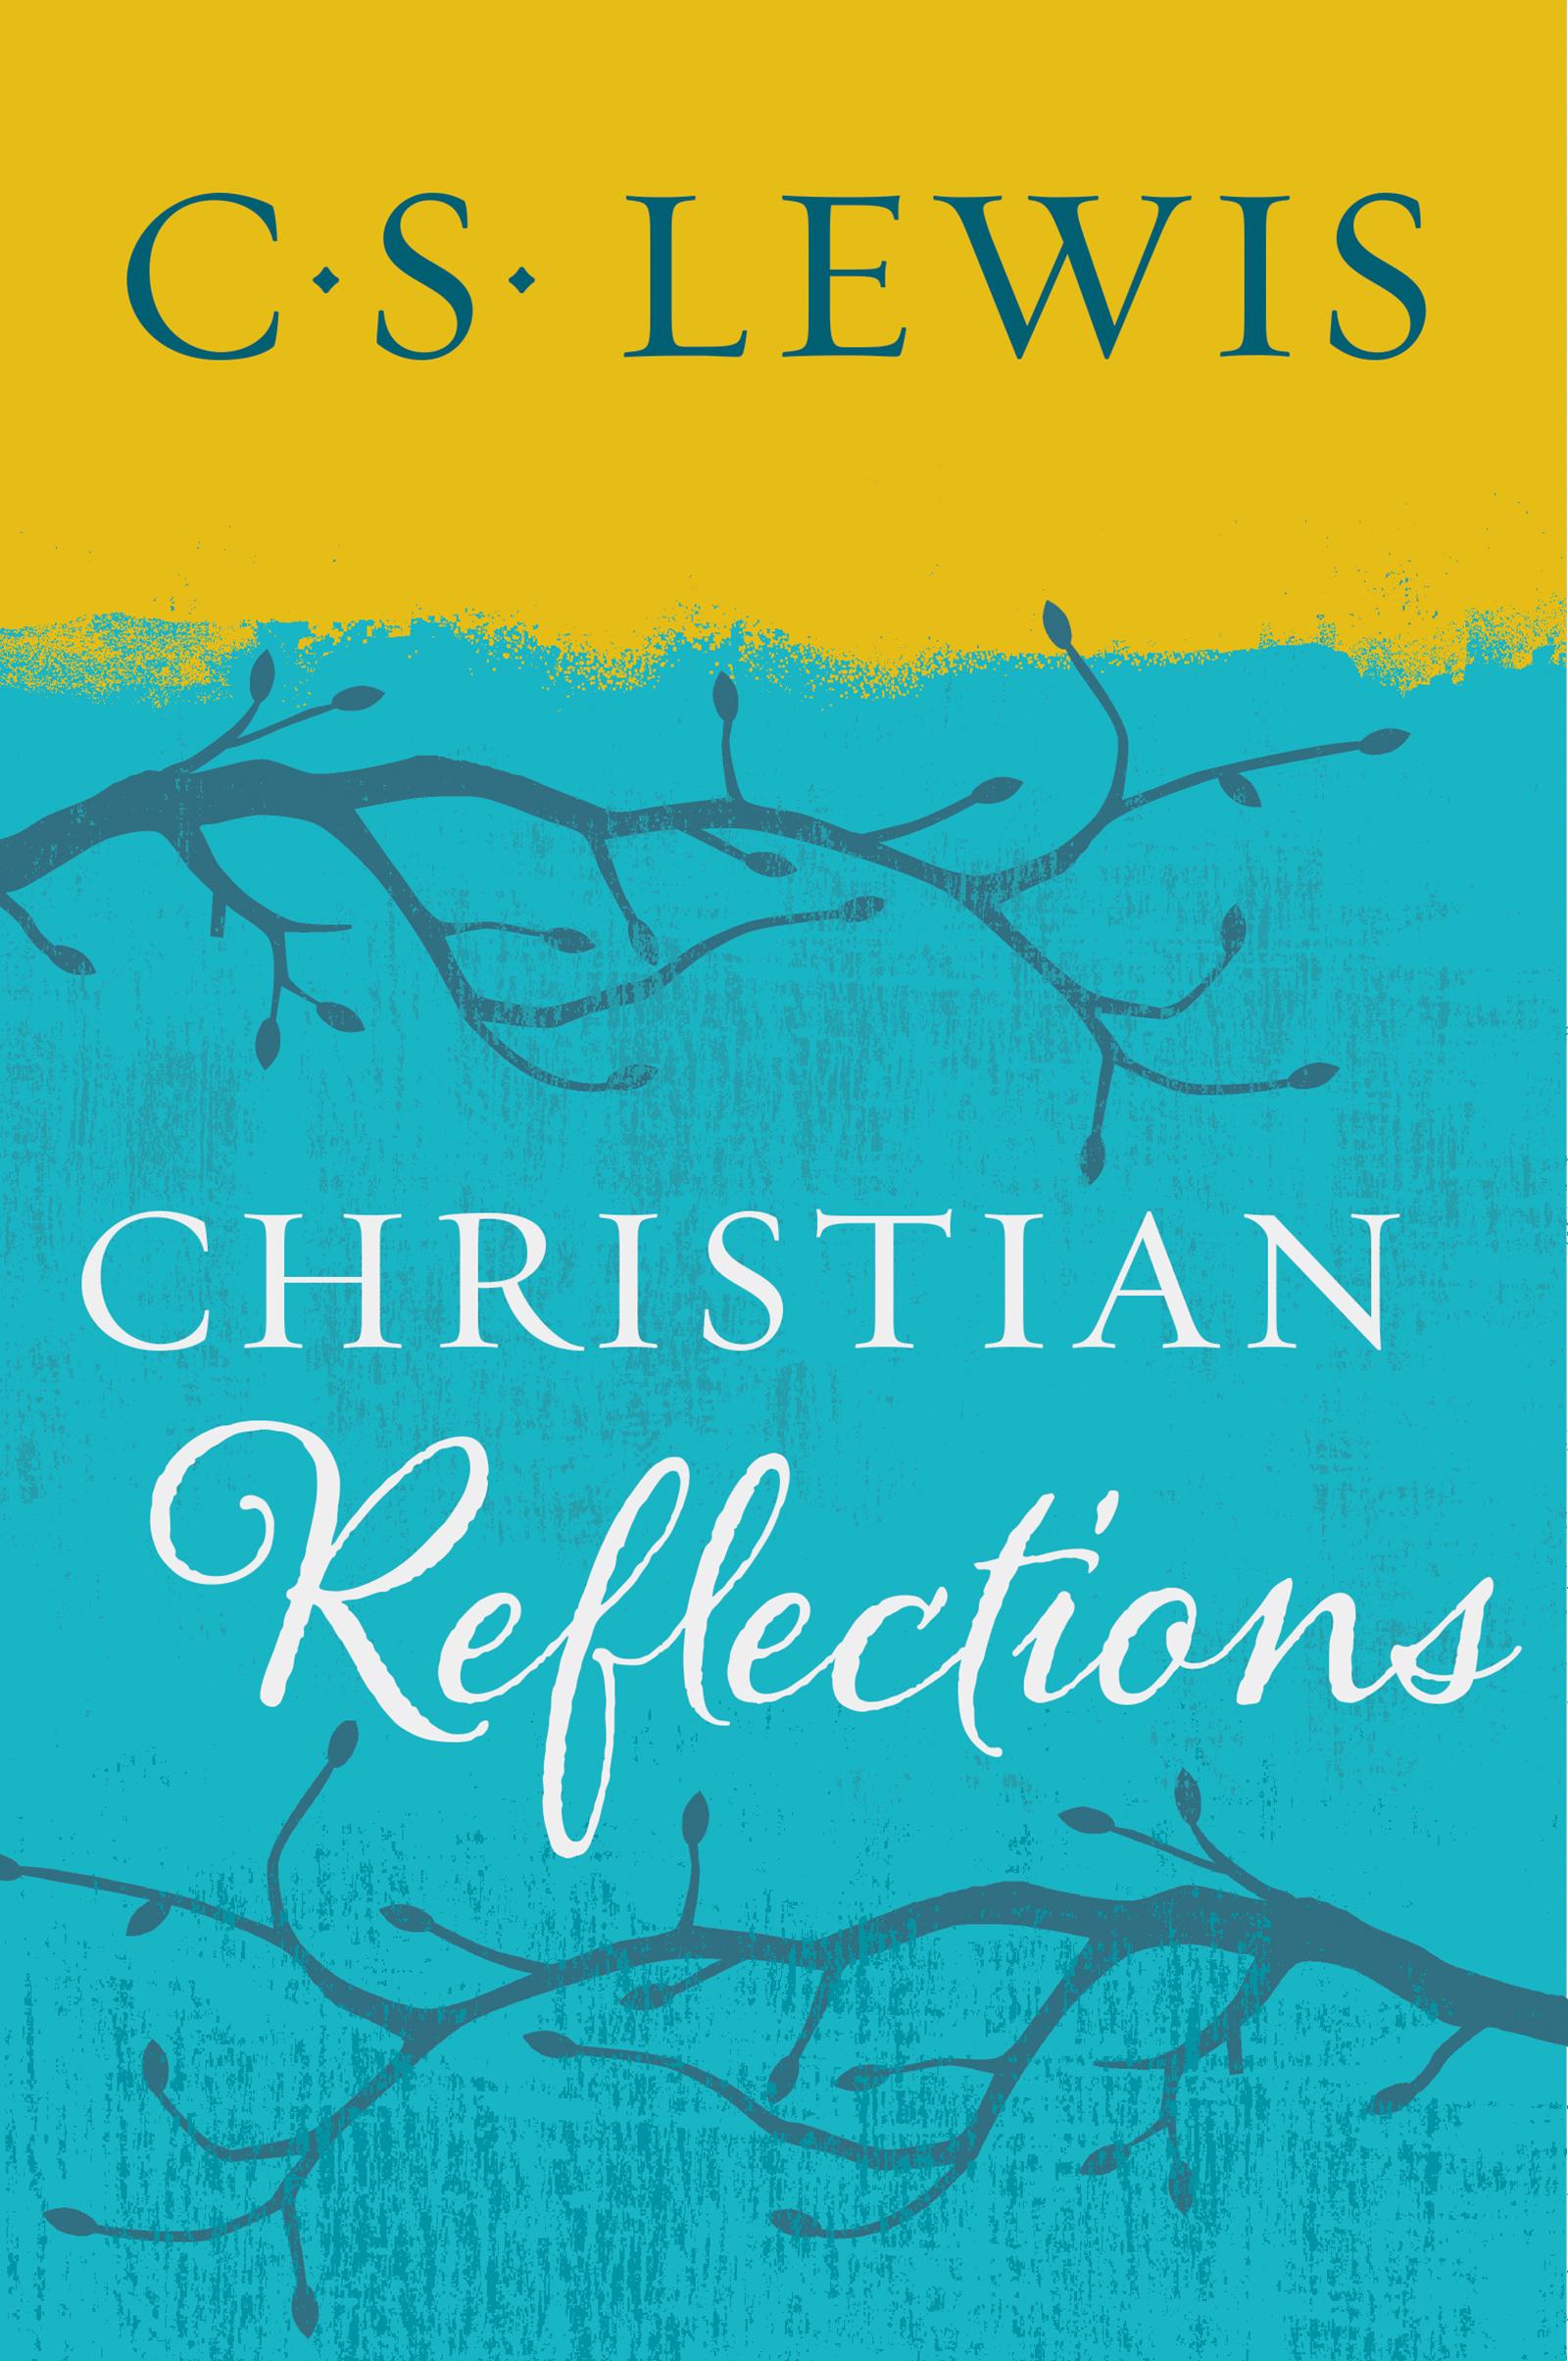 christianity bioethics essay